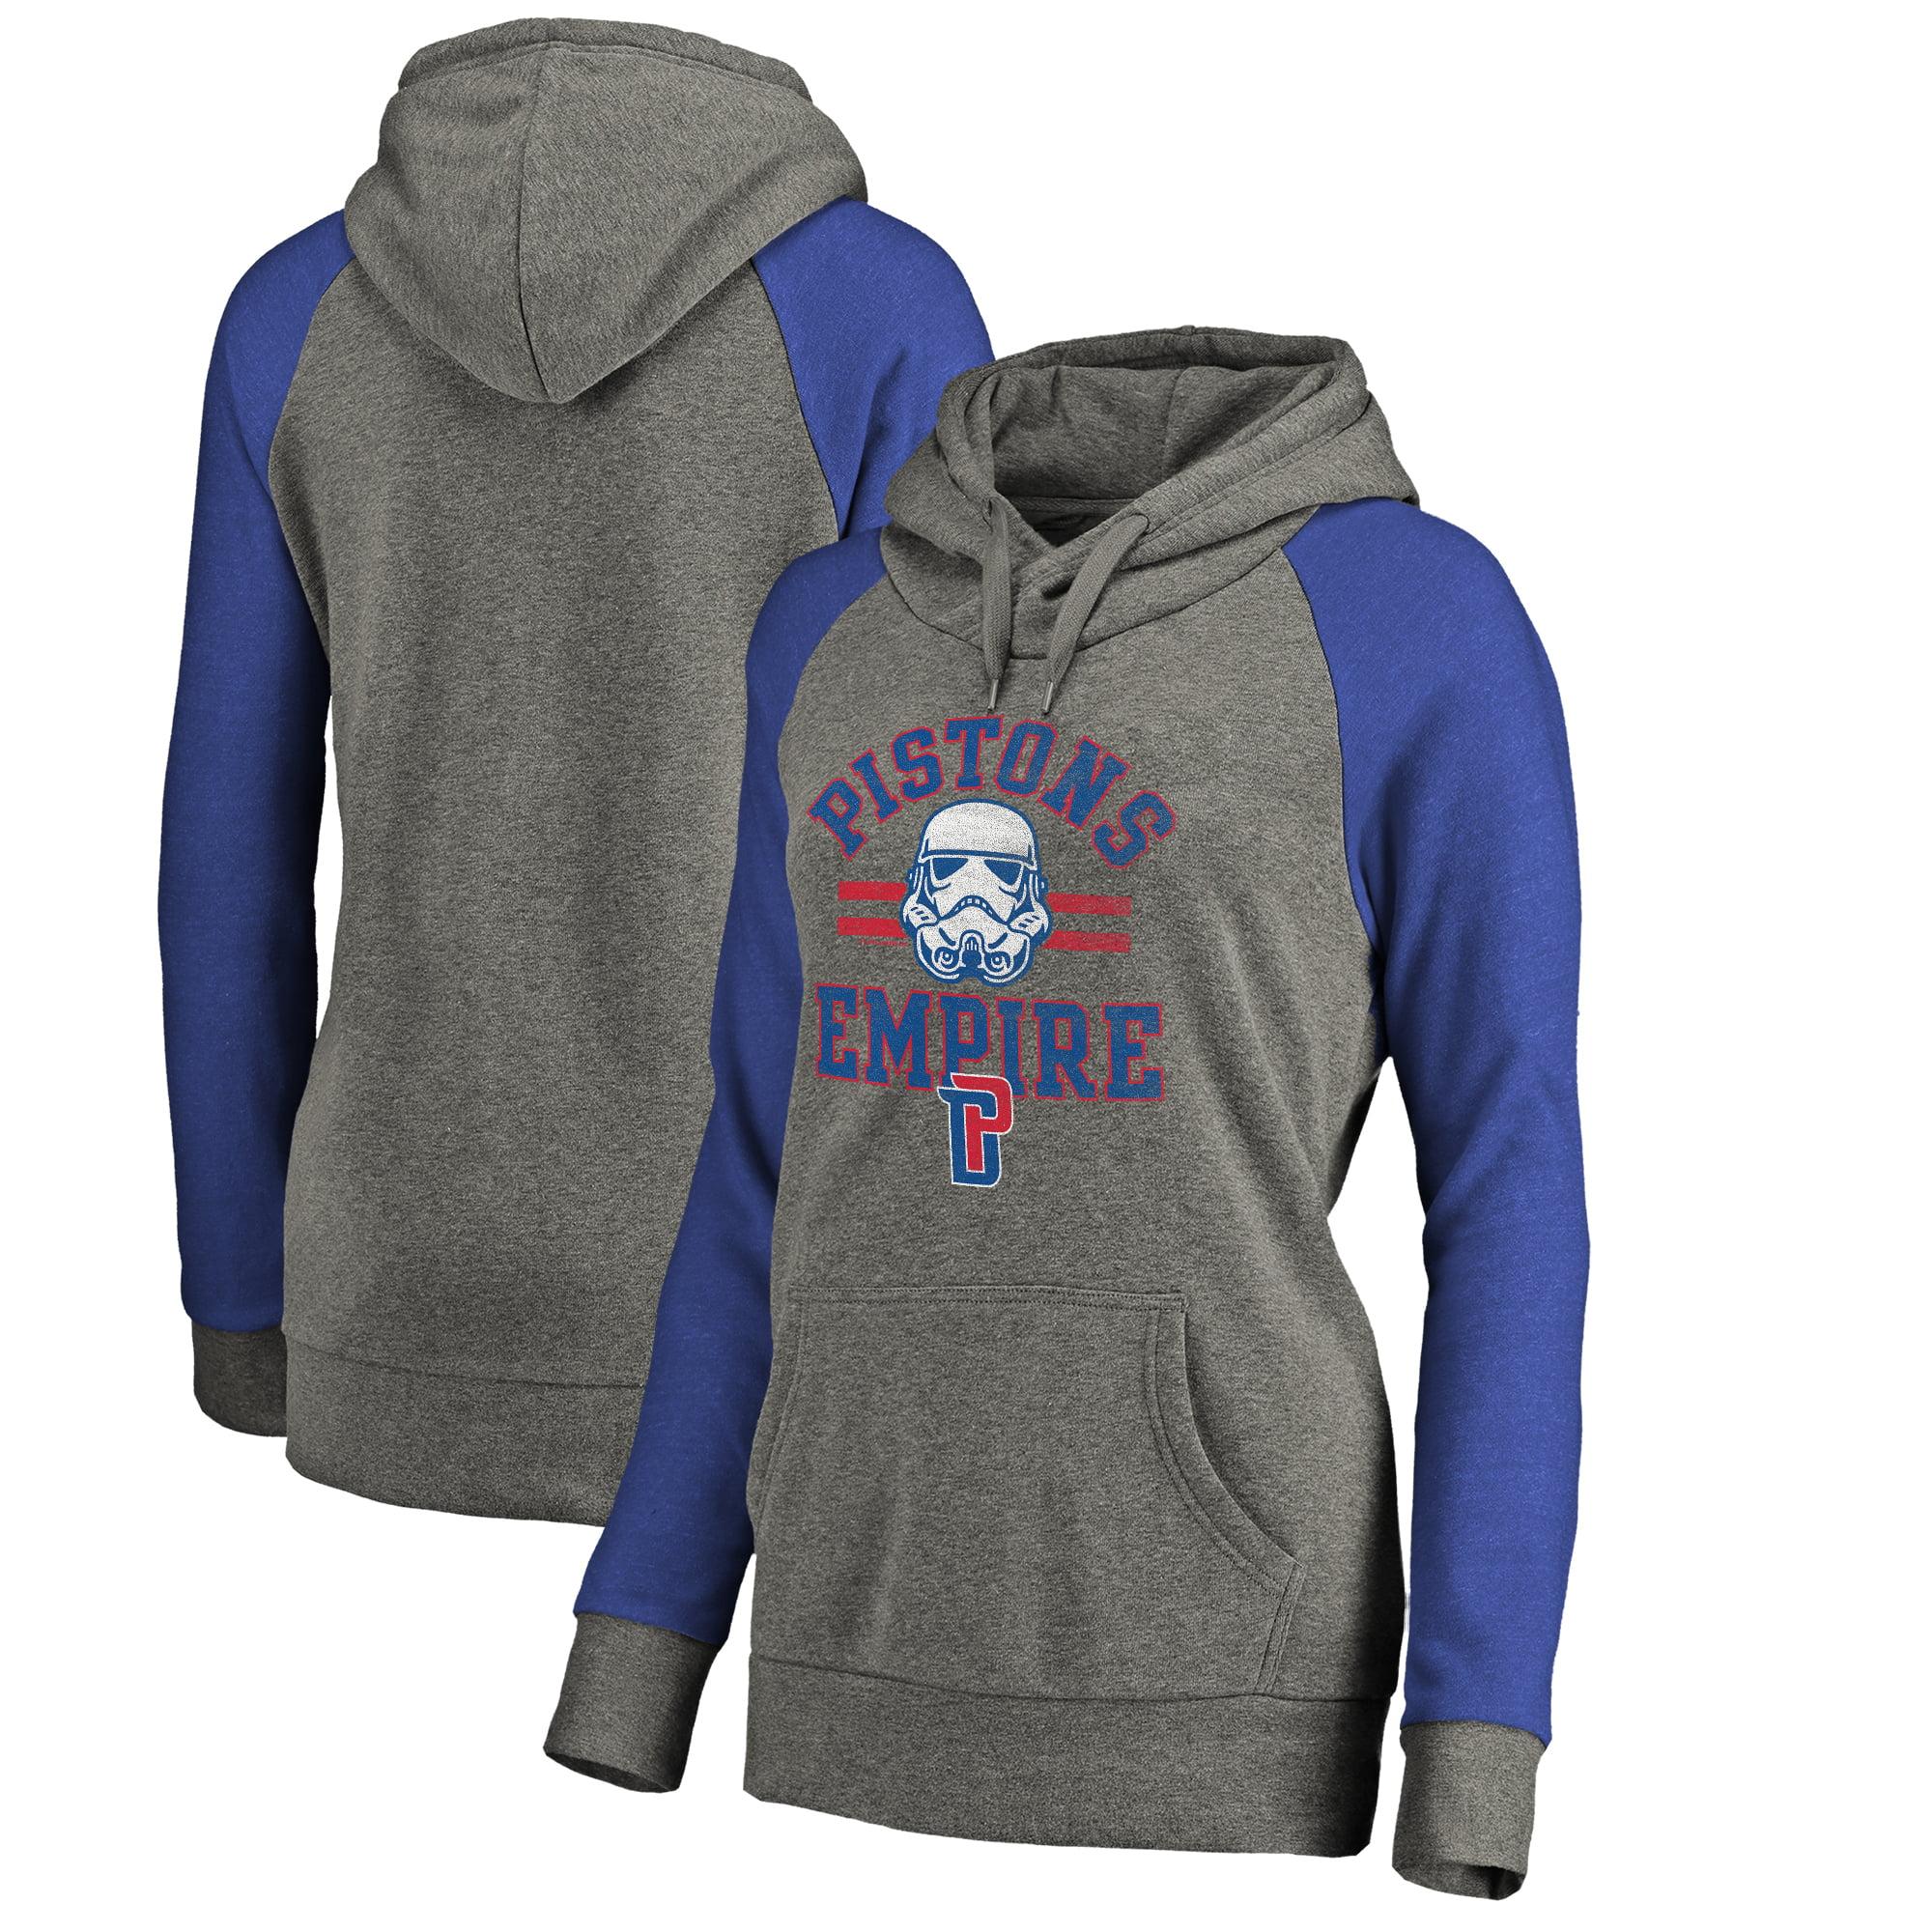 Detroit Pistons Fanatics Branded Women's Star Wars Empire Tri-Blend Raglan Pullover Hoodie - Heathered Gray